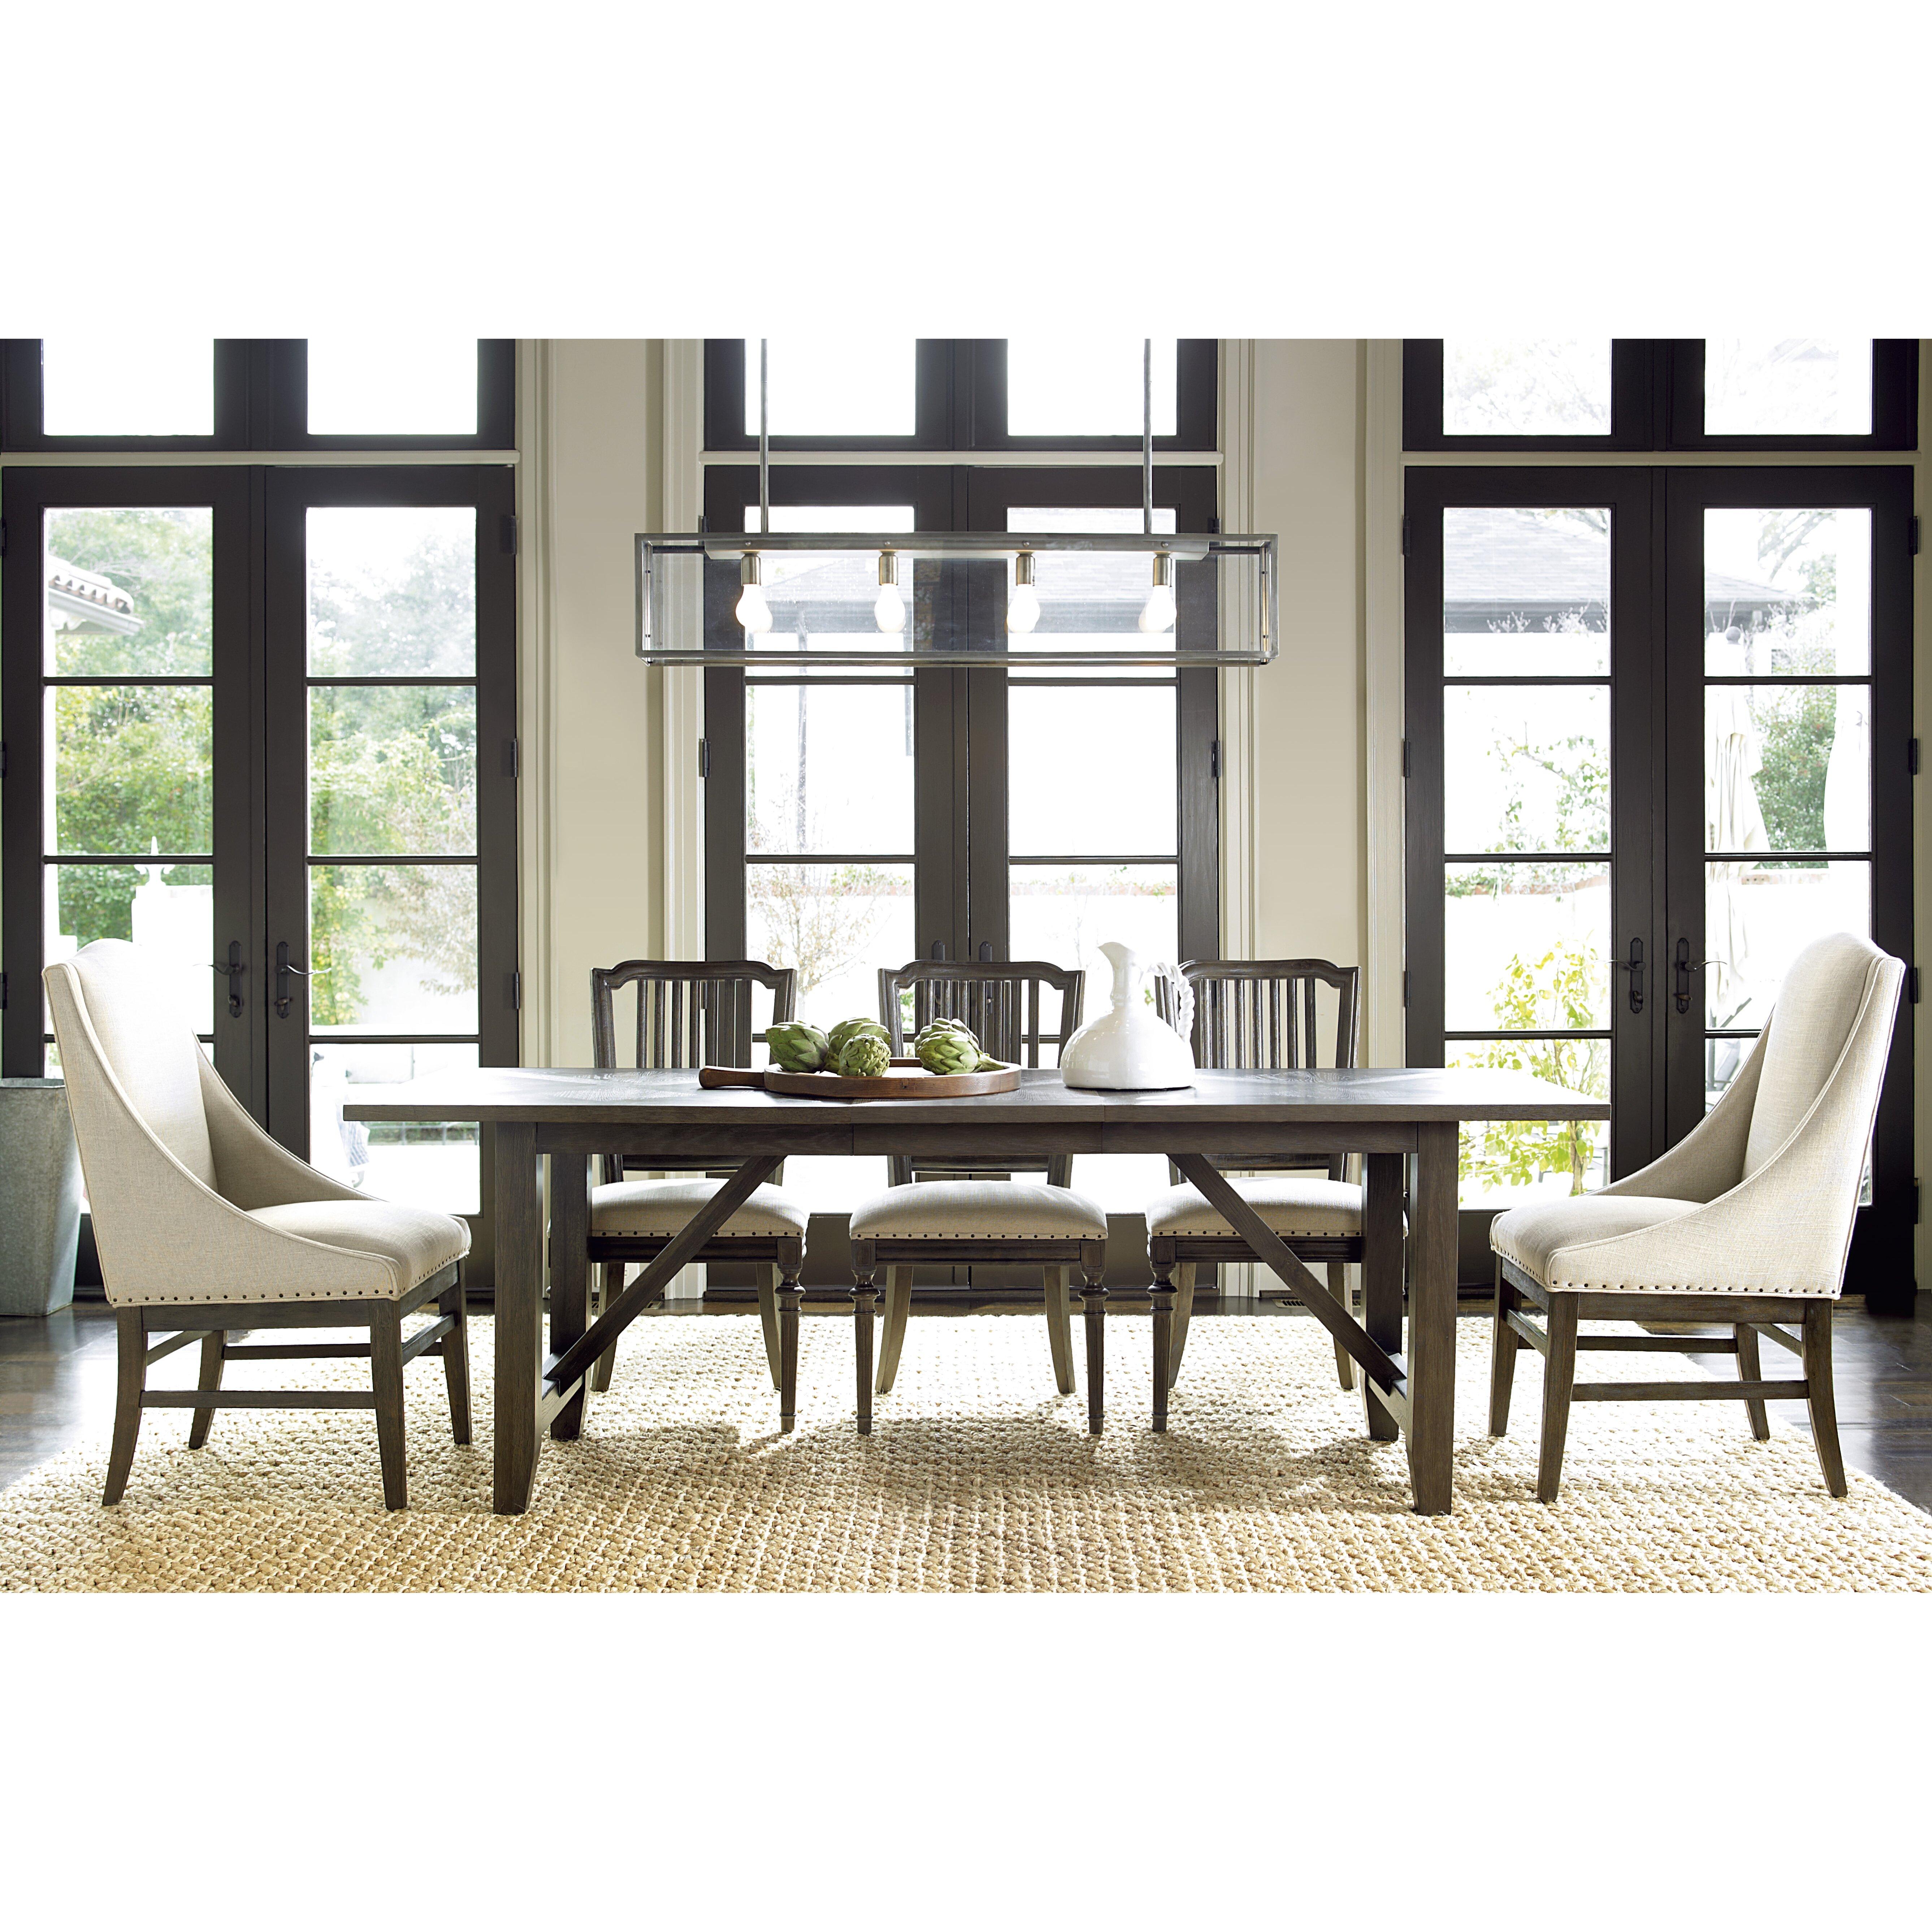 Universal furniture berkeley 3 urban arm chair reviews for Urban furniture